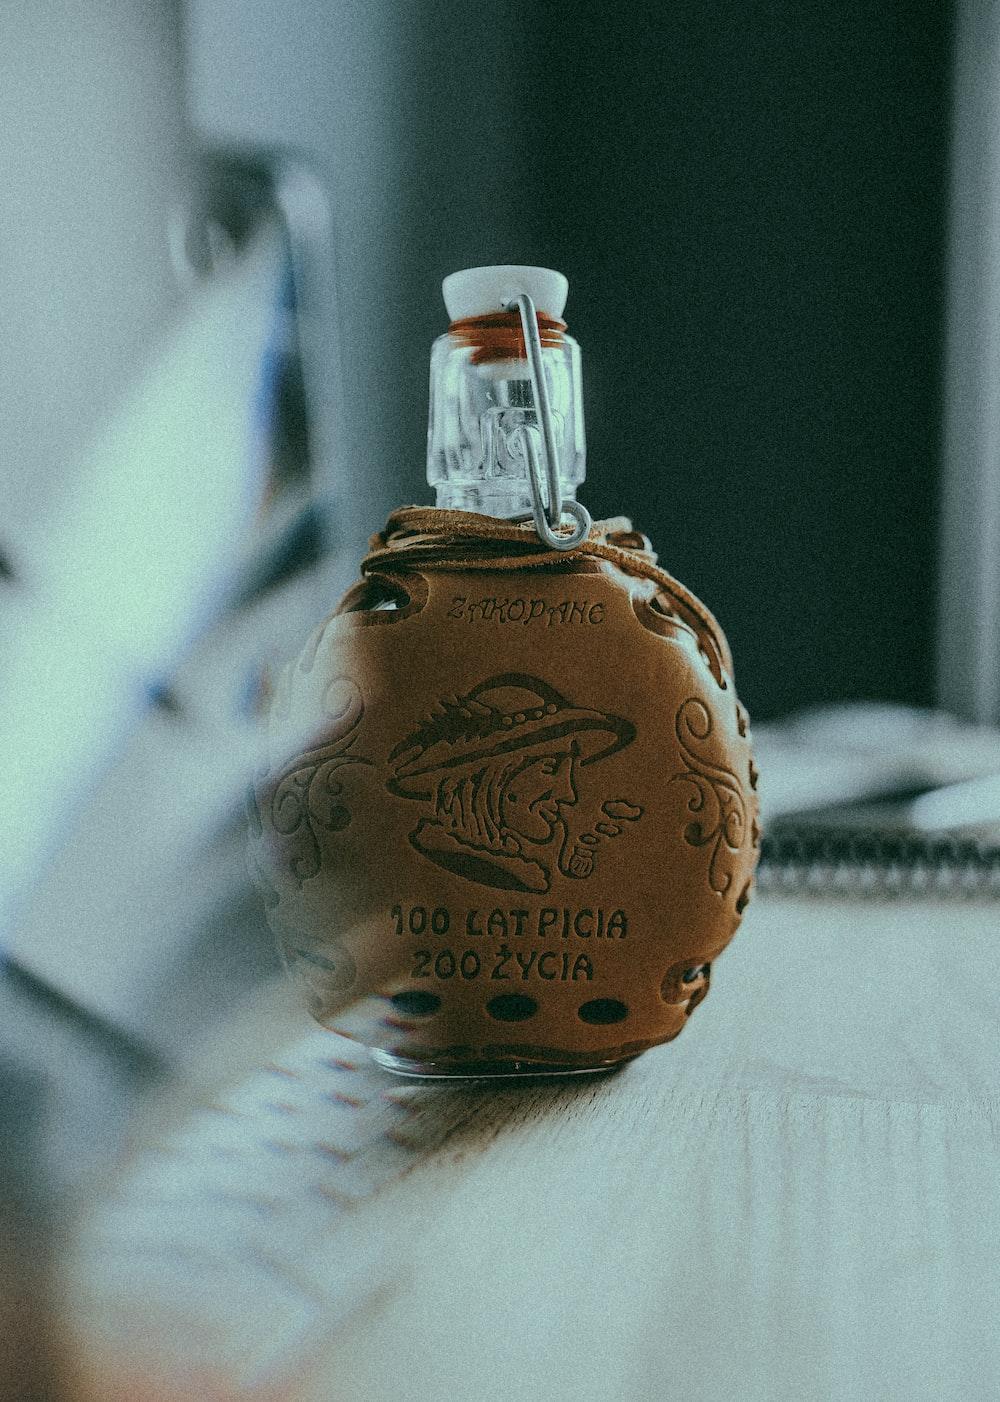 100 Eat Picia product bottle